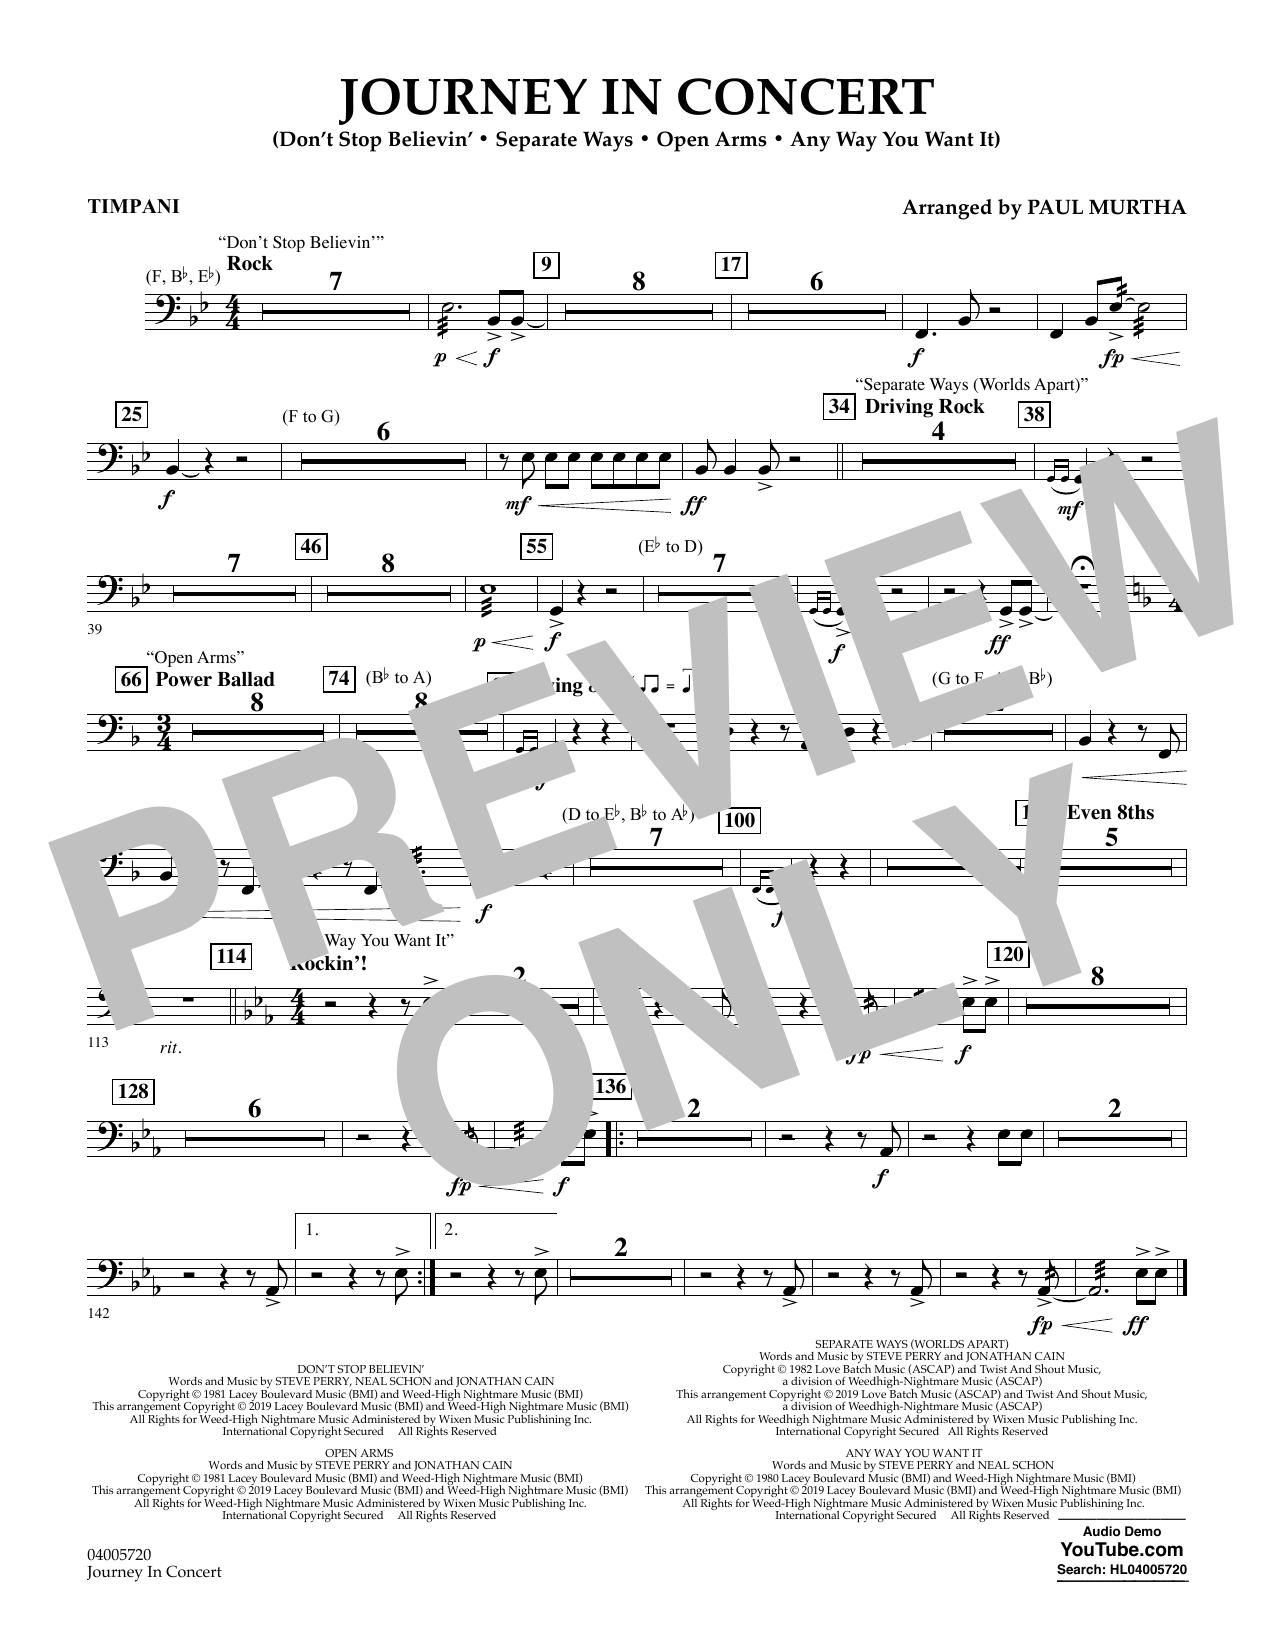 Journey in Concert (arr. Paul Murtha) - Timpani (Flex-Band)